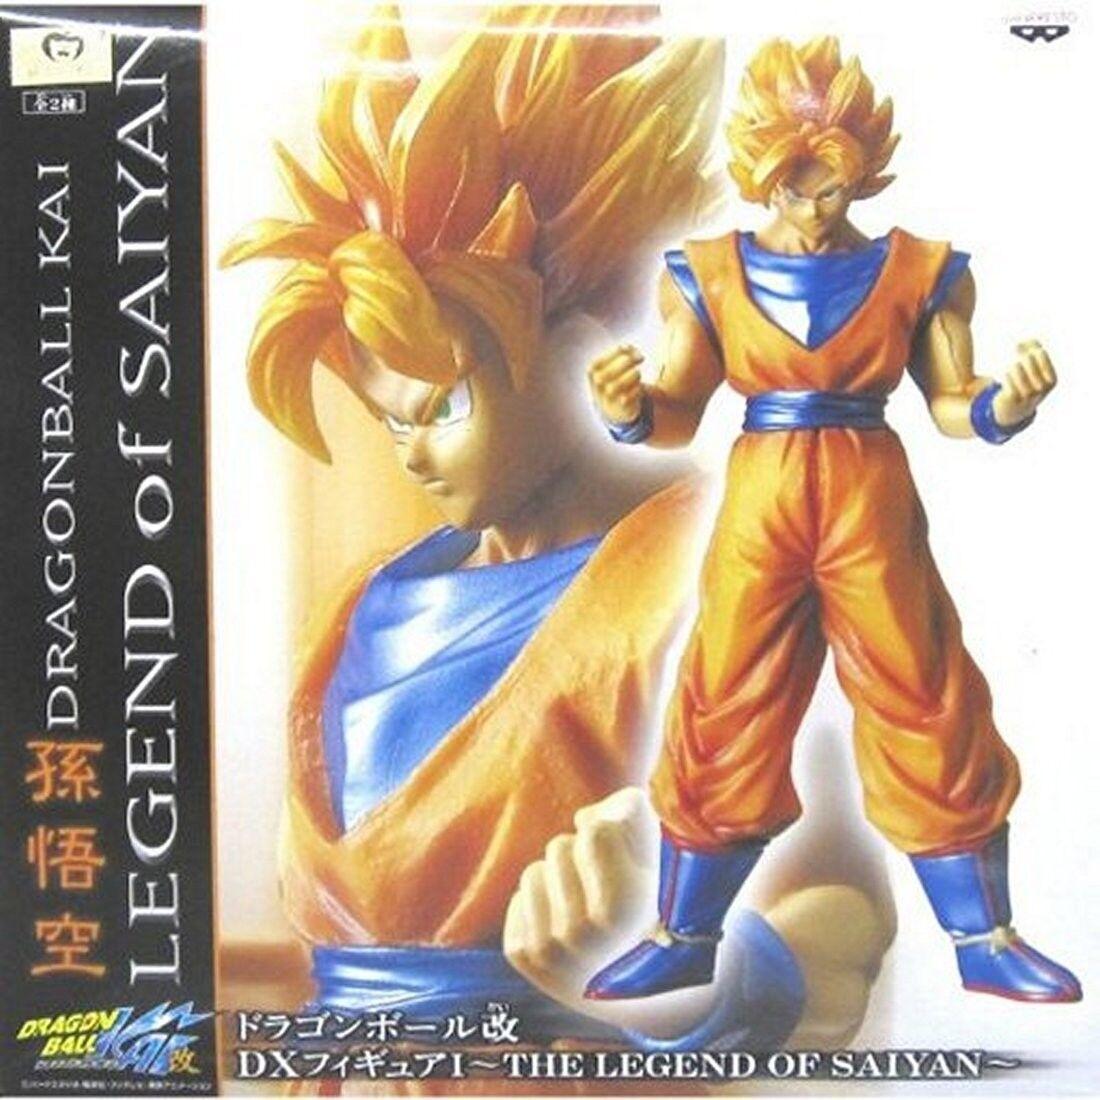 Dragon Ball Kai DX - The Legend of Saiyan Saiyan Saiyan - 6  Figure  Son Goku f2f0c6